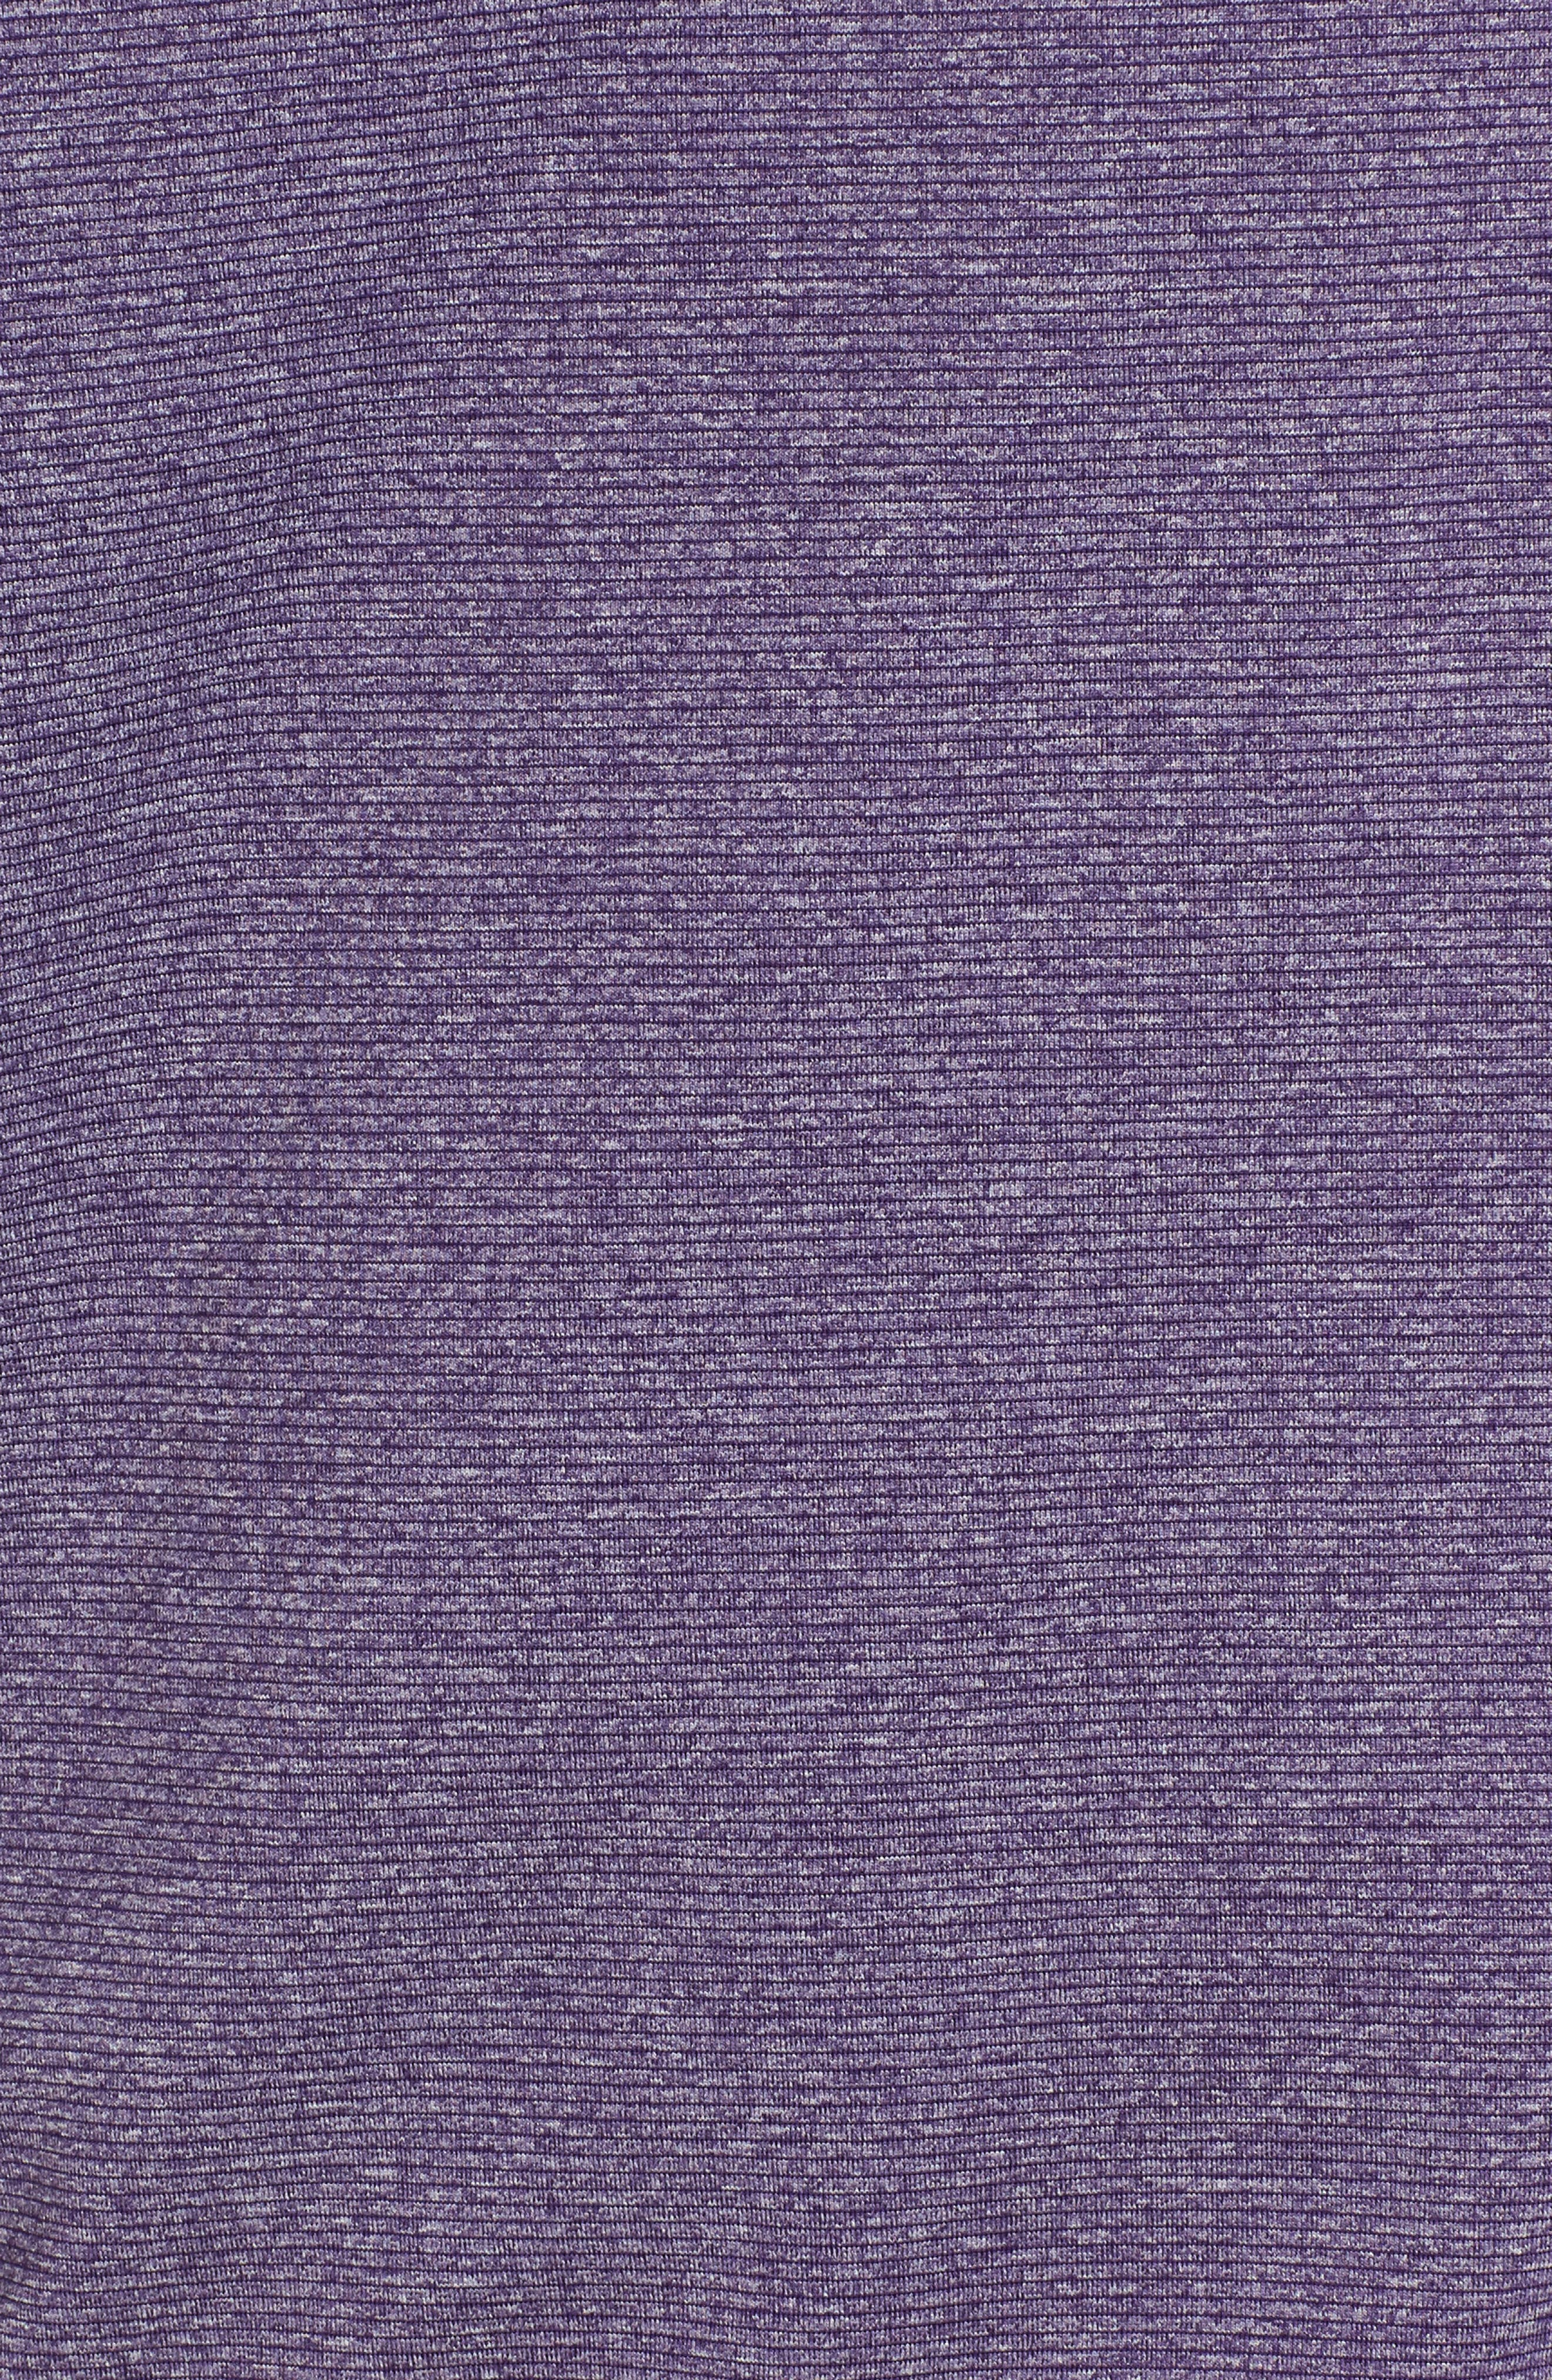 Shoreline - Baltimore Ravens Half Zip Pullover,                             Alternate thumbnail 5, color,                             513